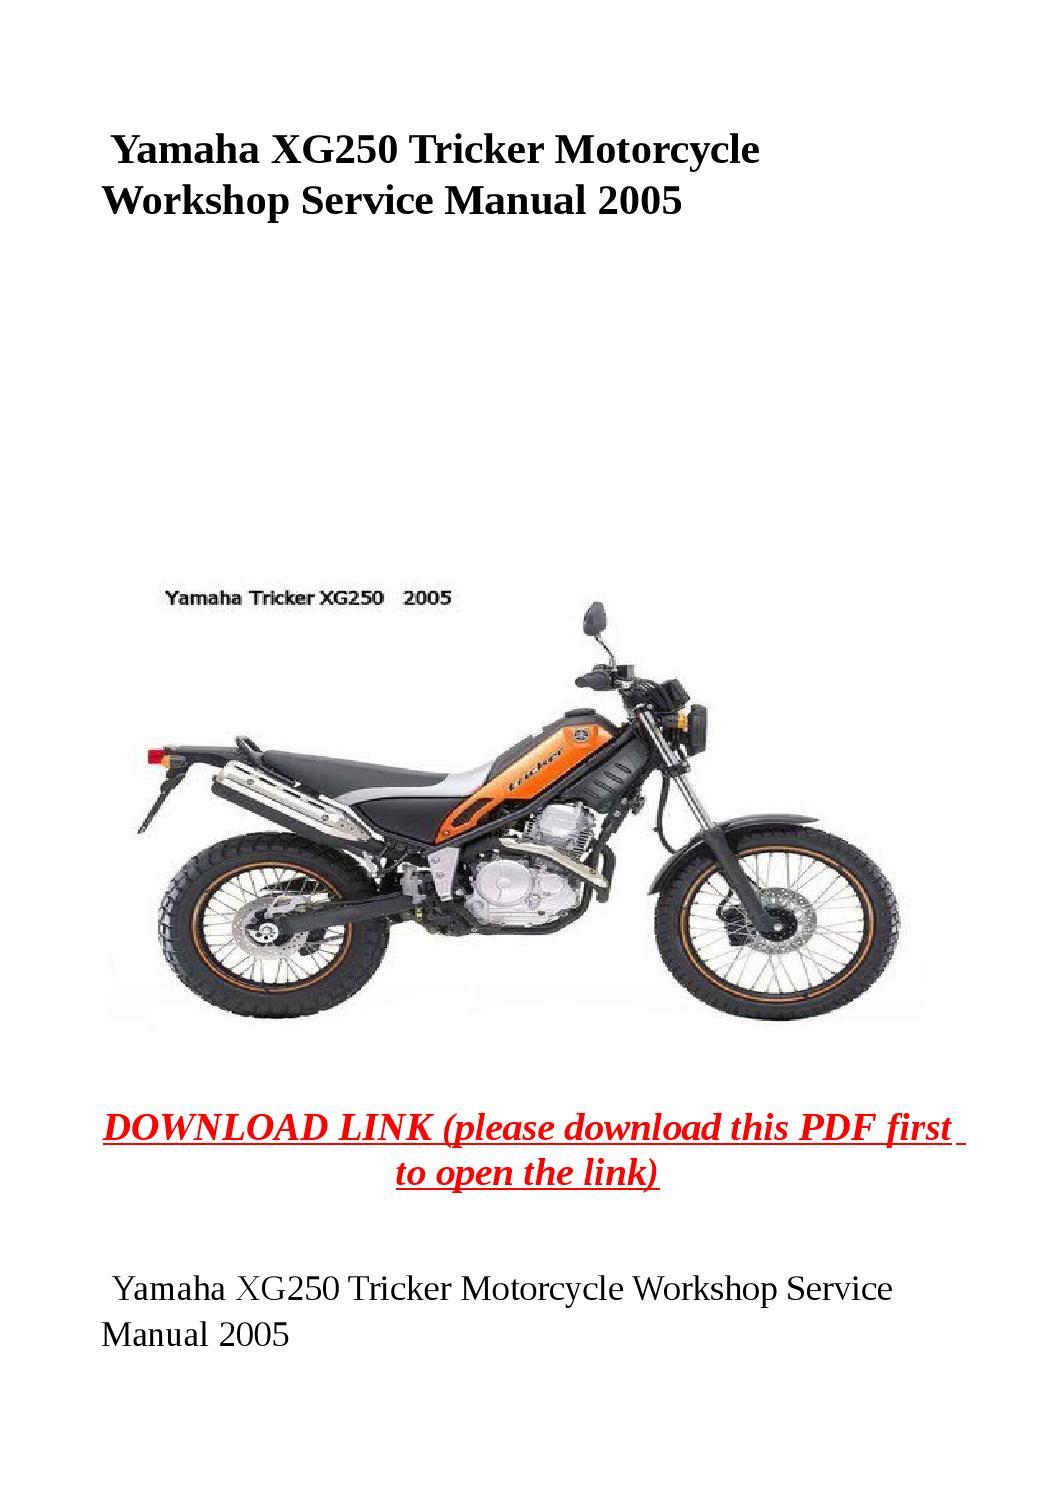 Yamaha Xg250 Tricker Motorcycle Workshop Service Manual